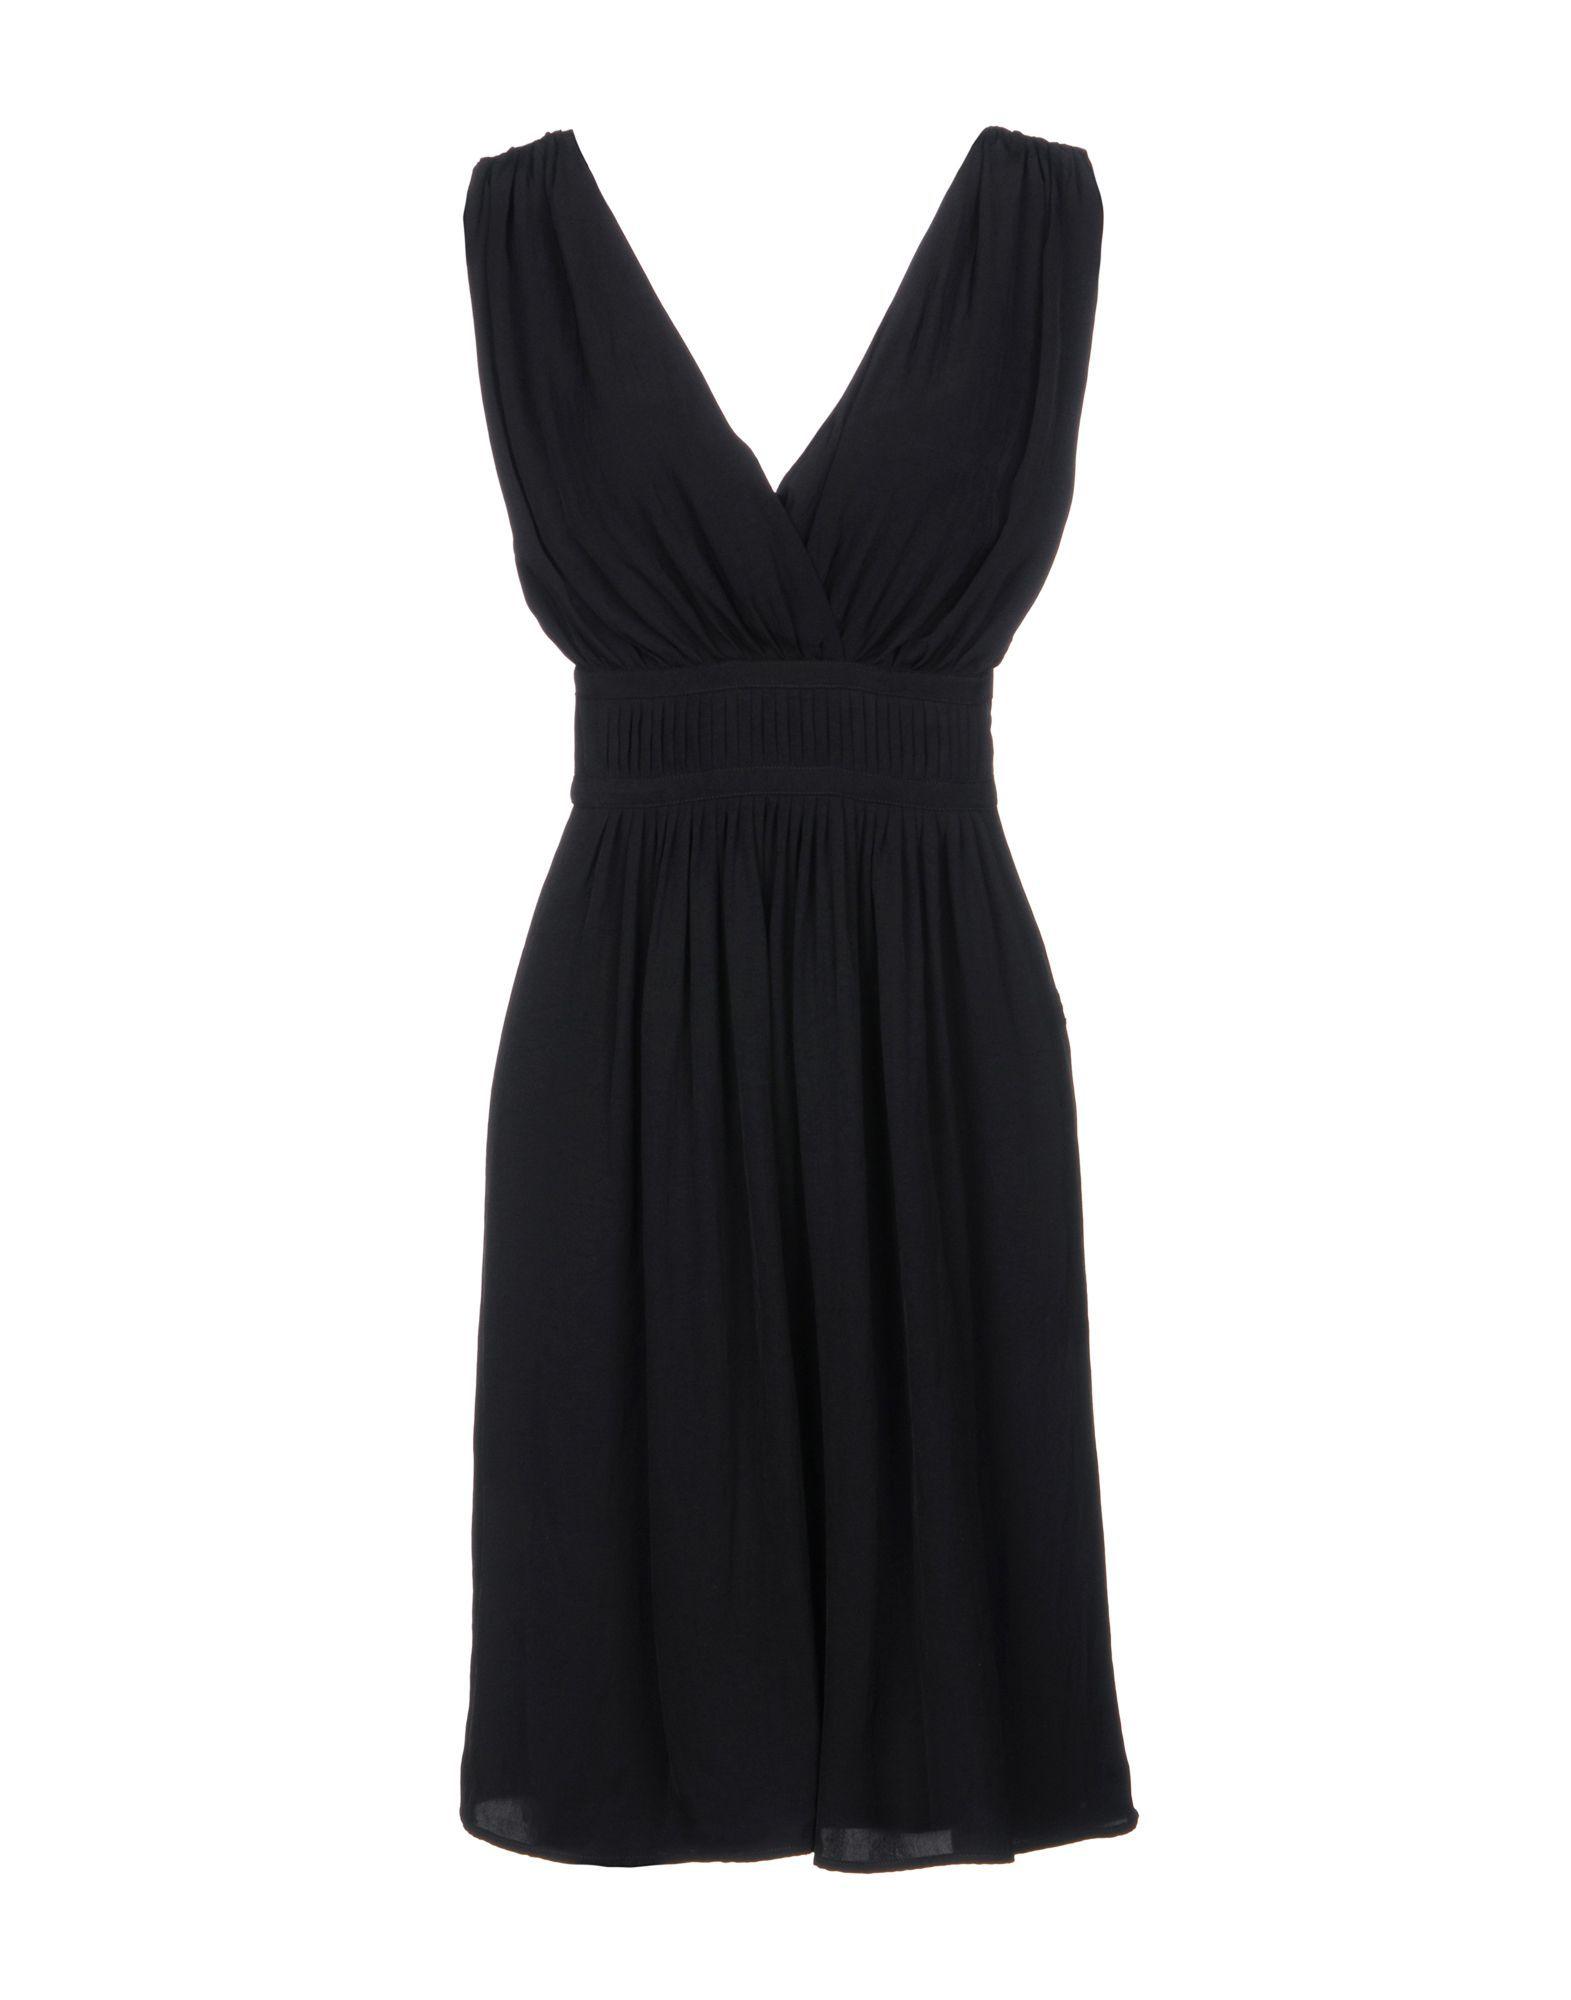 Isabel Marant Etoile Black V Neckline Dress